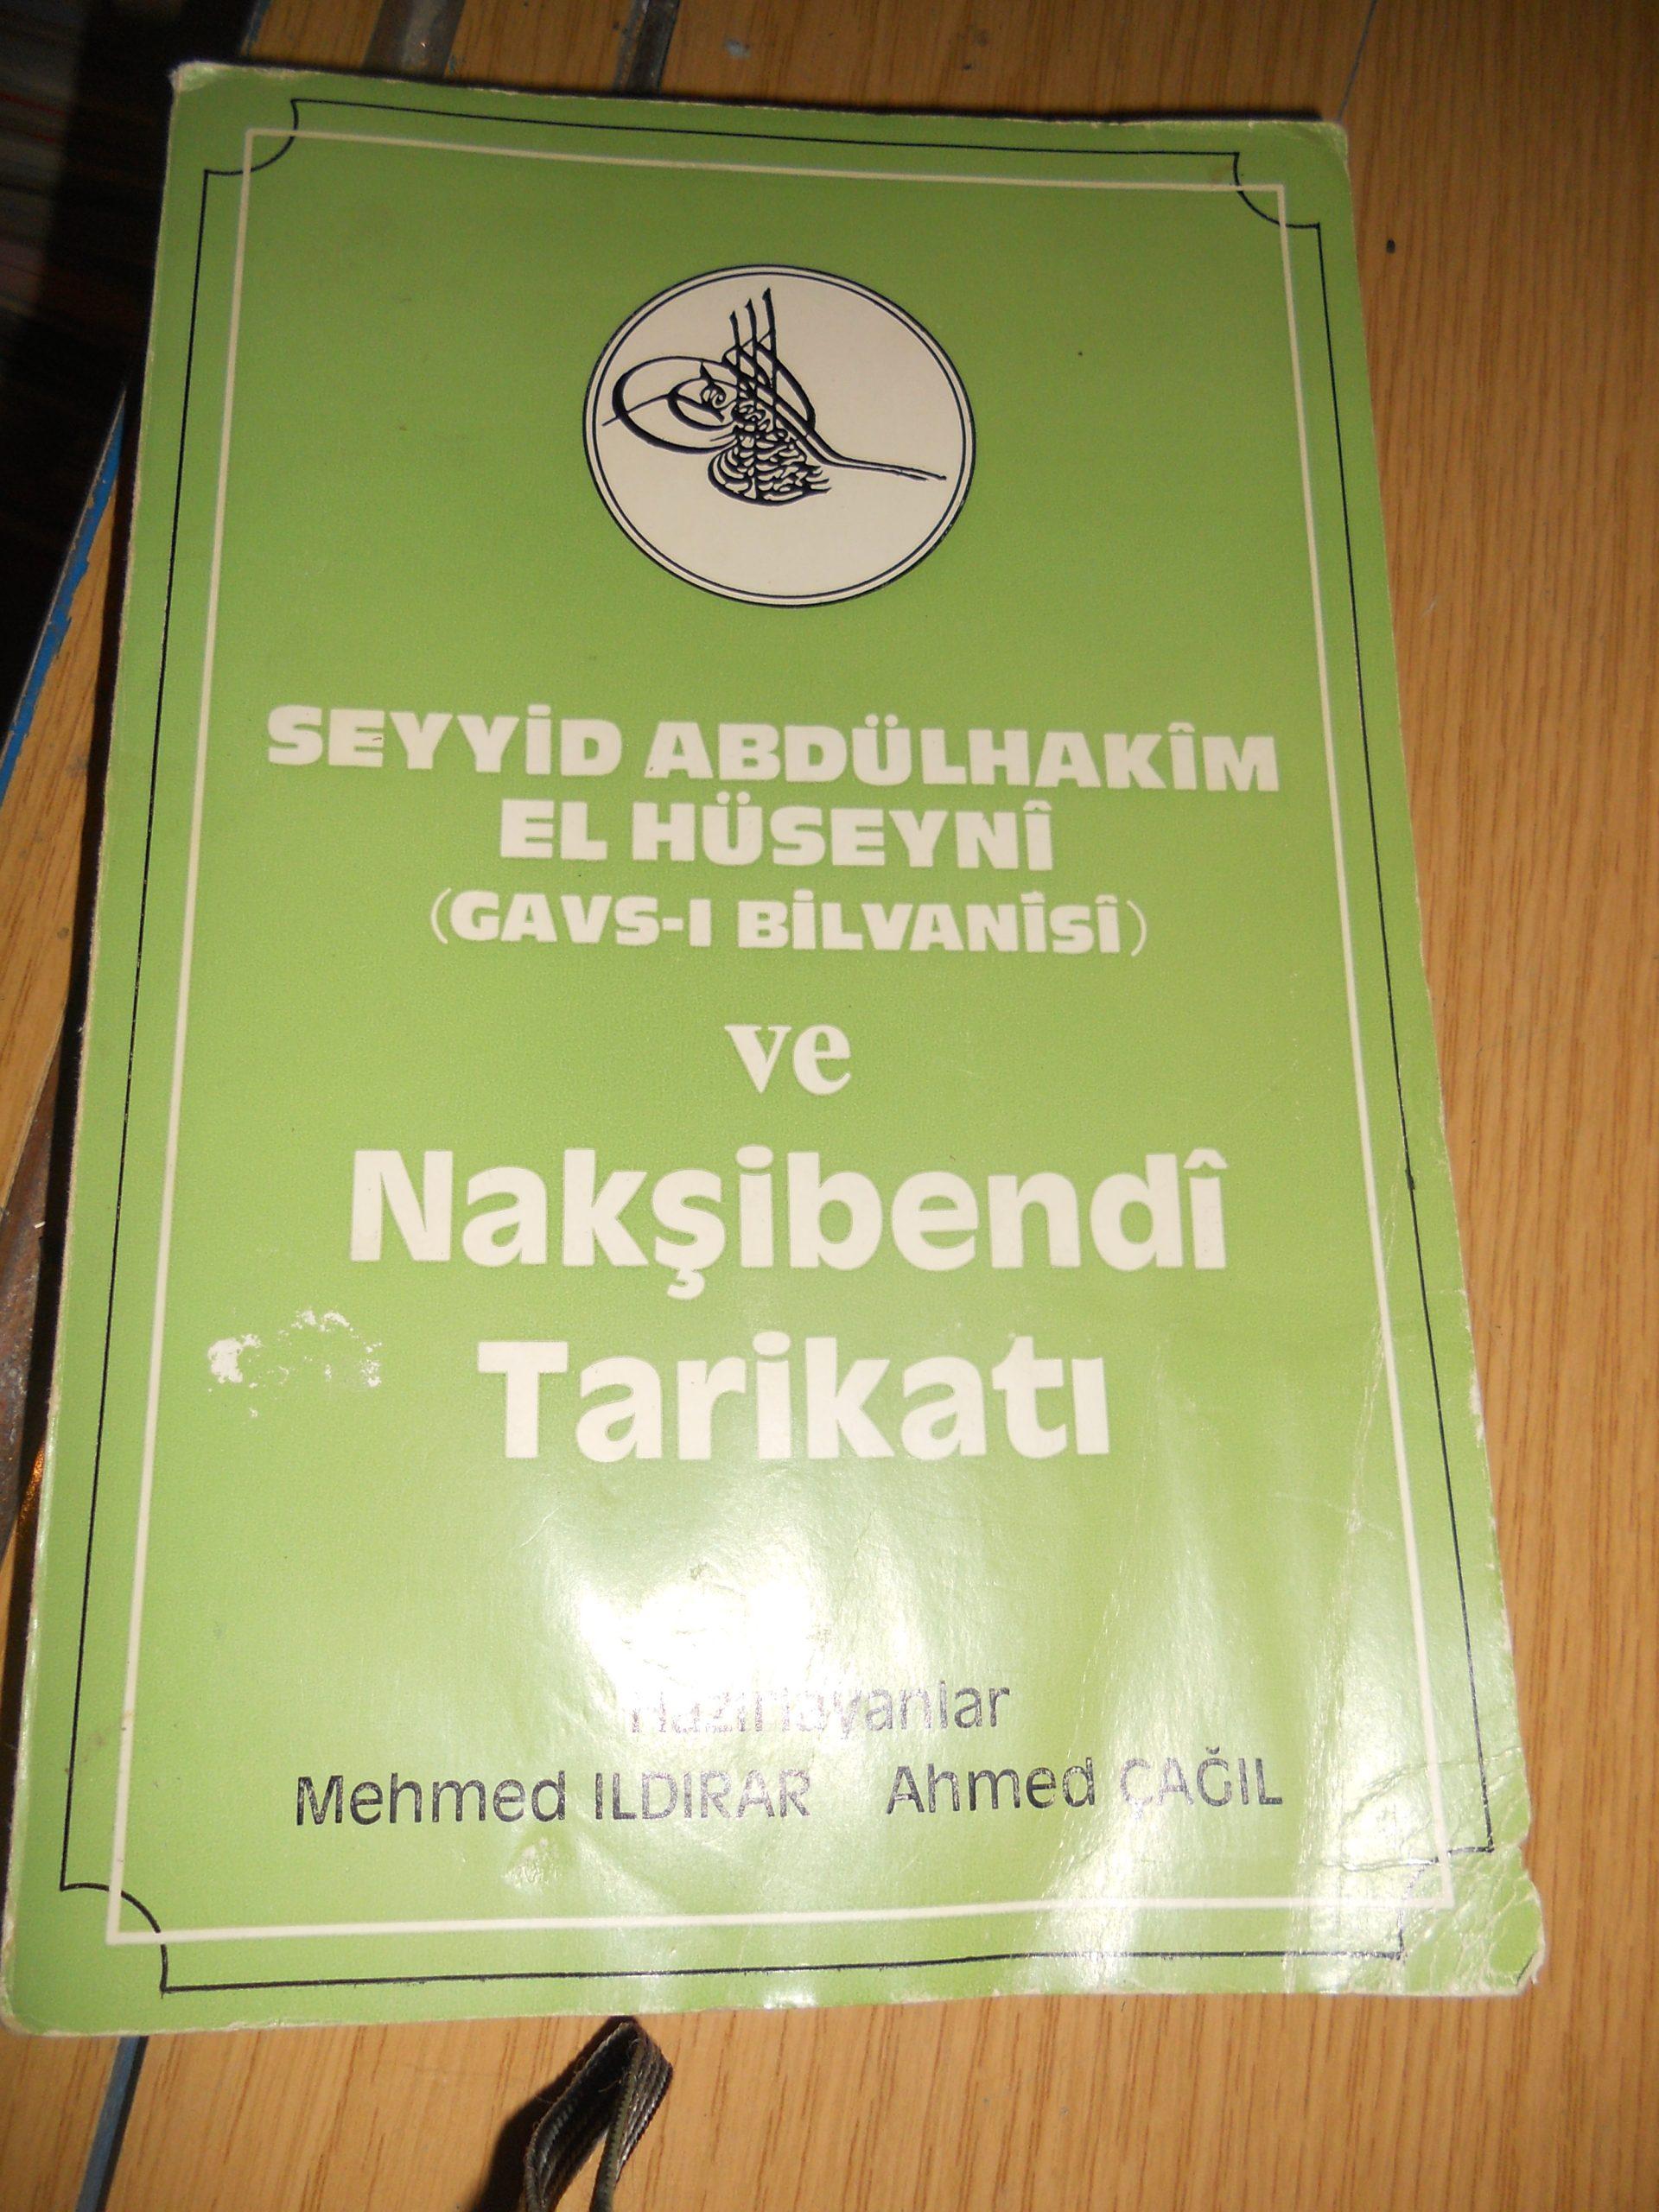 Seyyid Abdulhakim el Hüseyni ve NAKŞİBENDİ TARİKATI/Dr.Ahmet ÇAĞIL/20 tl(SATILDI)